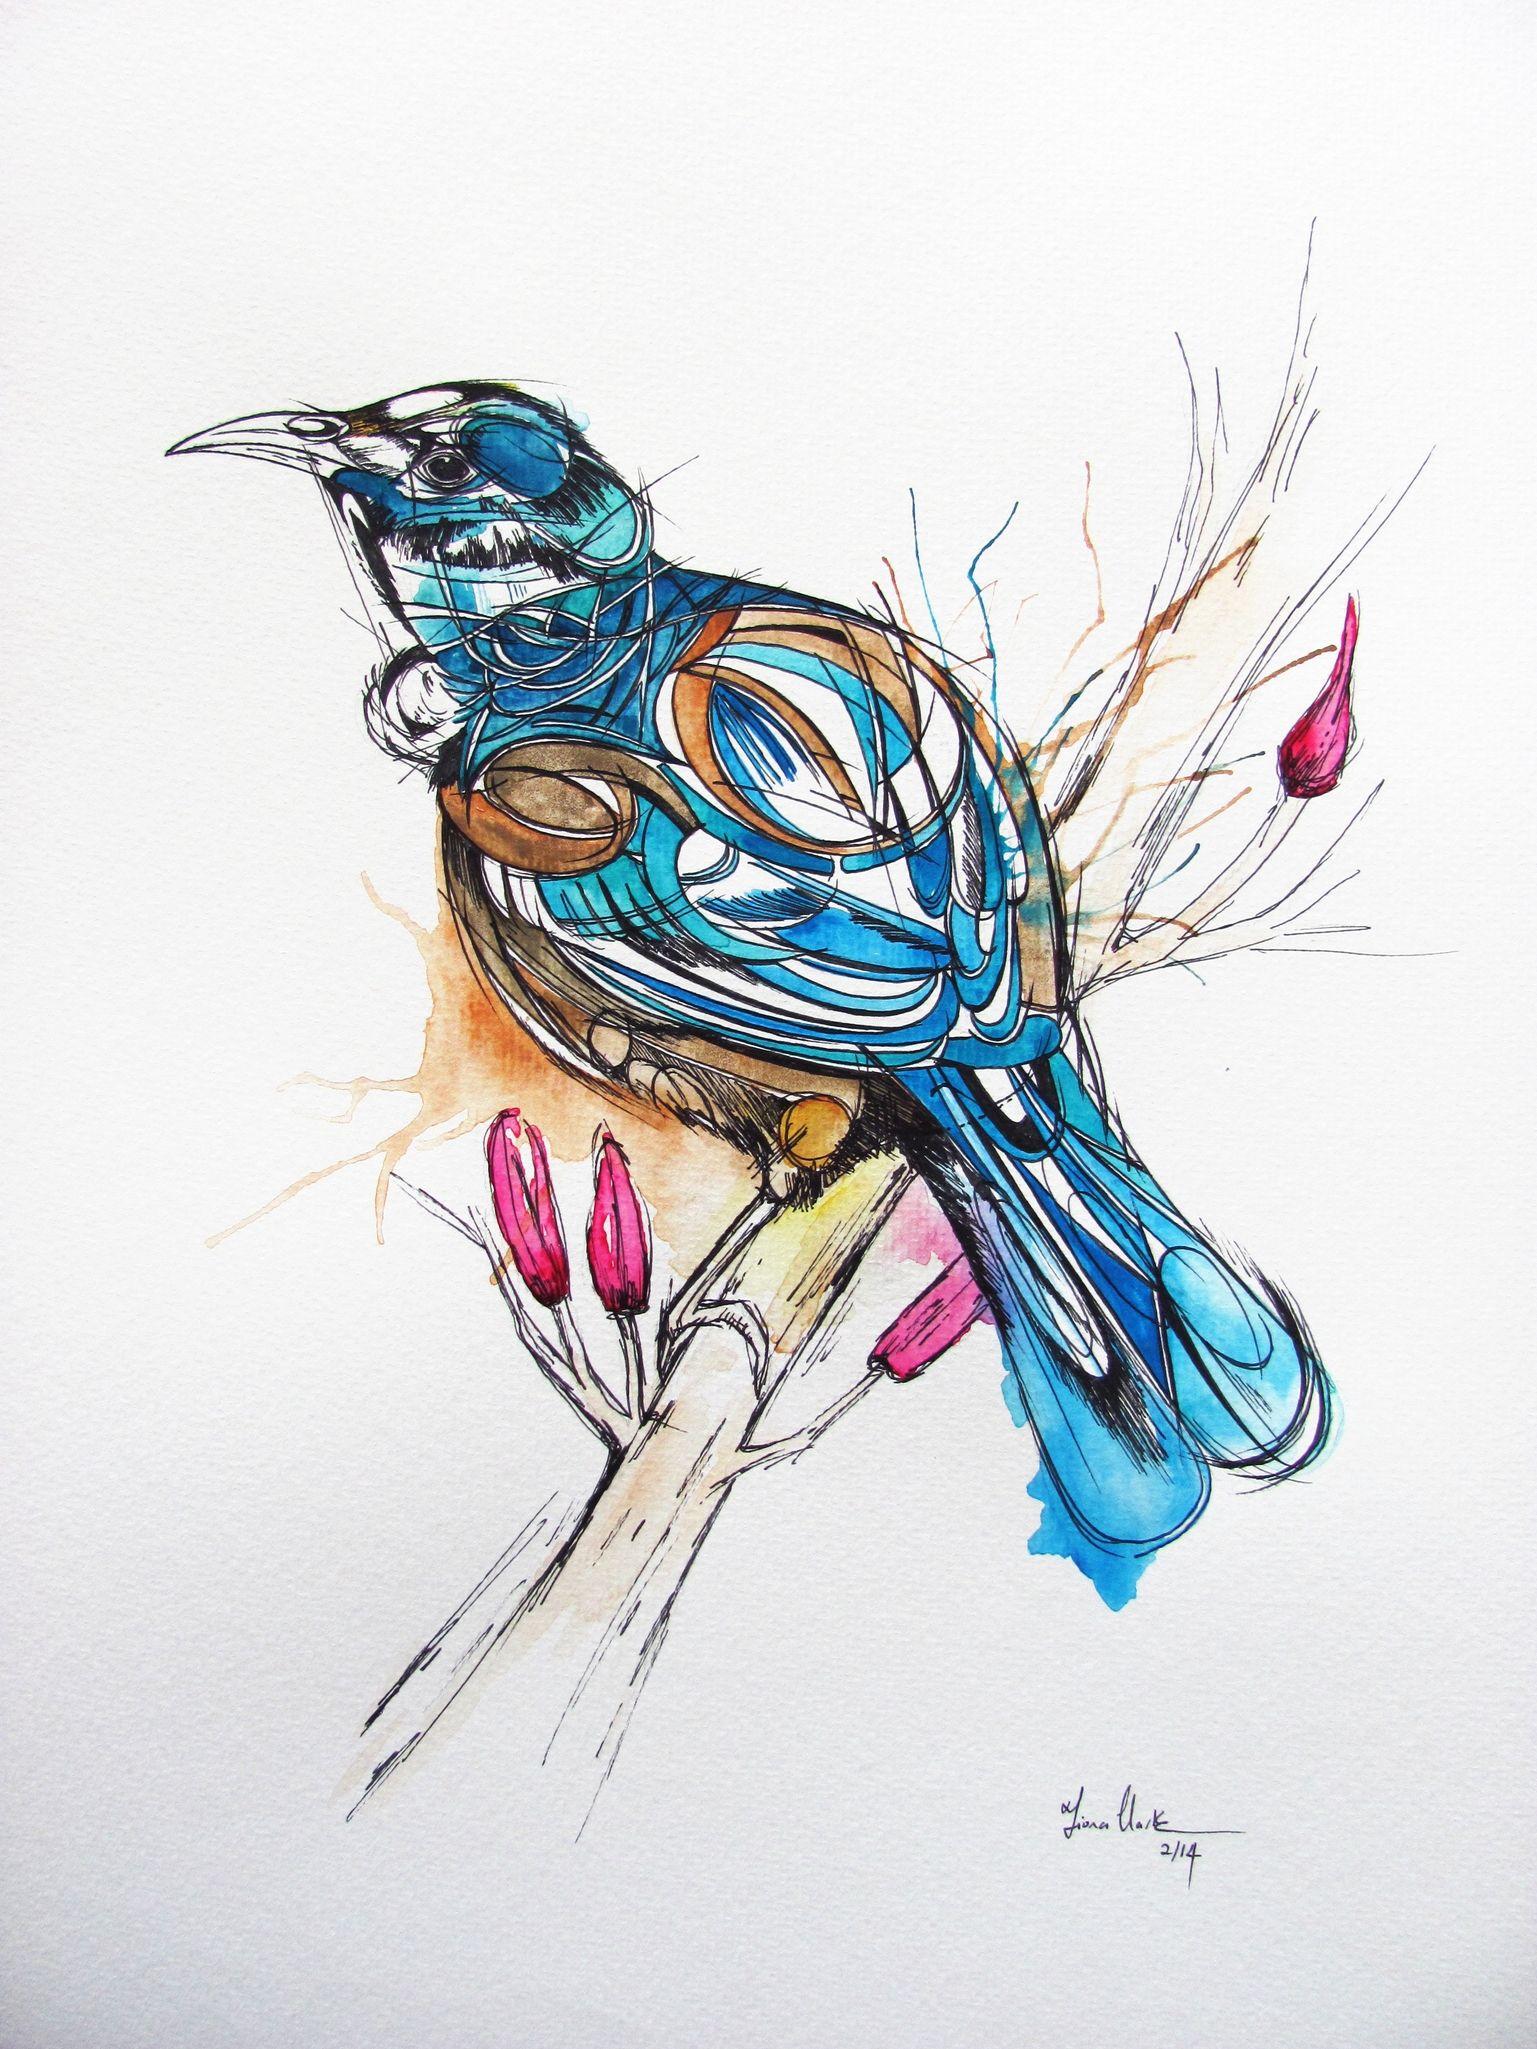 inked tui bird illustration watercolour art pinterest bird illustrations and tattoo. Black Bedroom Furniture Sets. Home Design Ideas